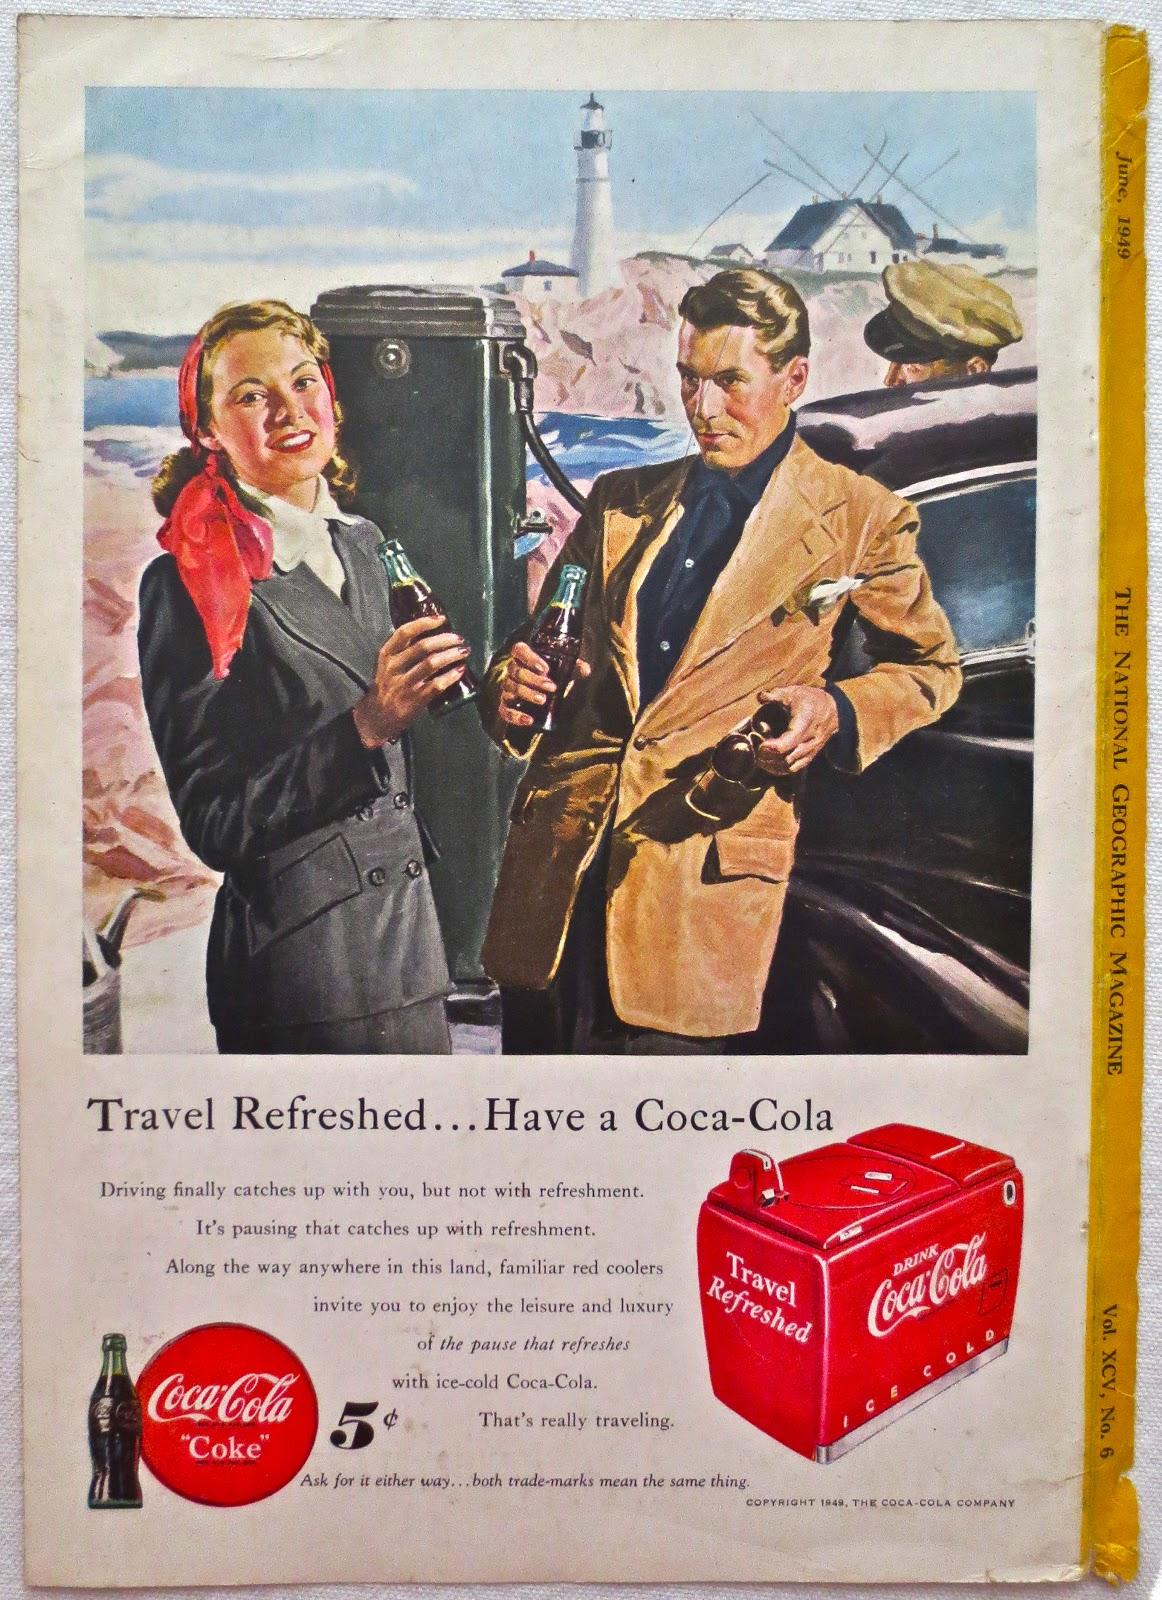 Sexist Advertisements 2017 - 0425